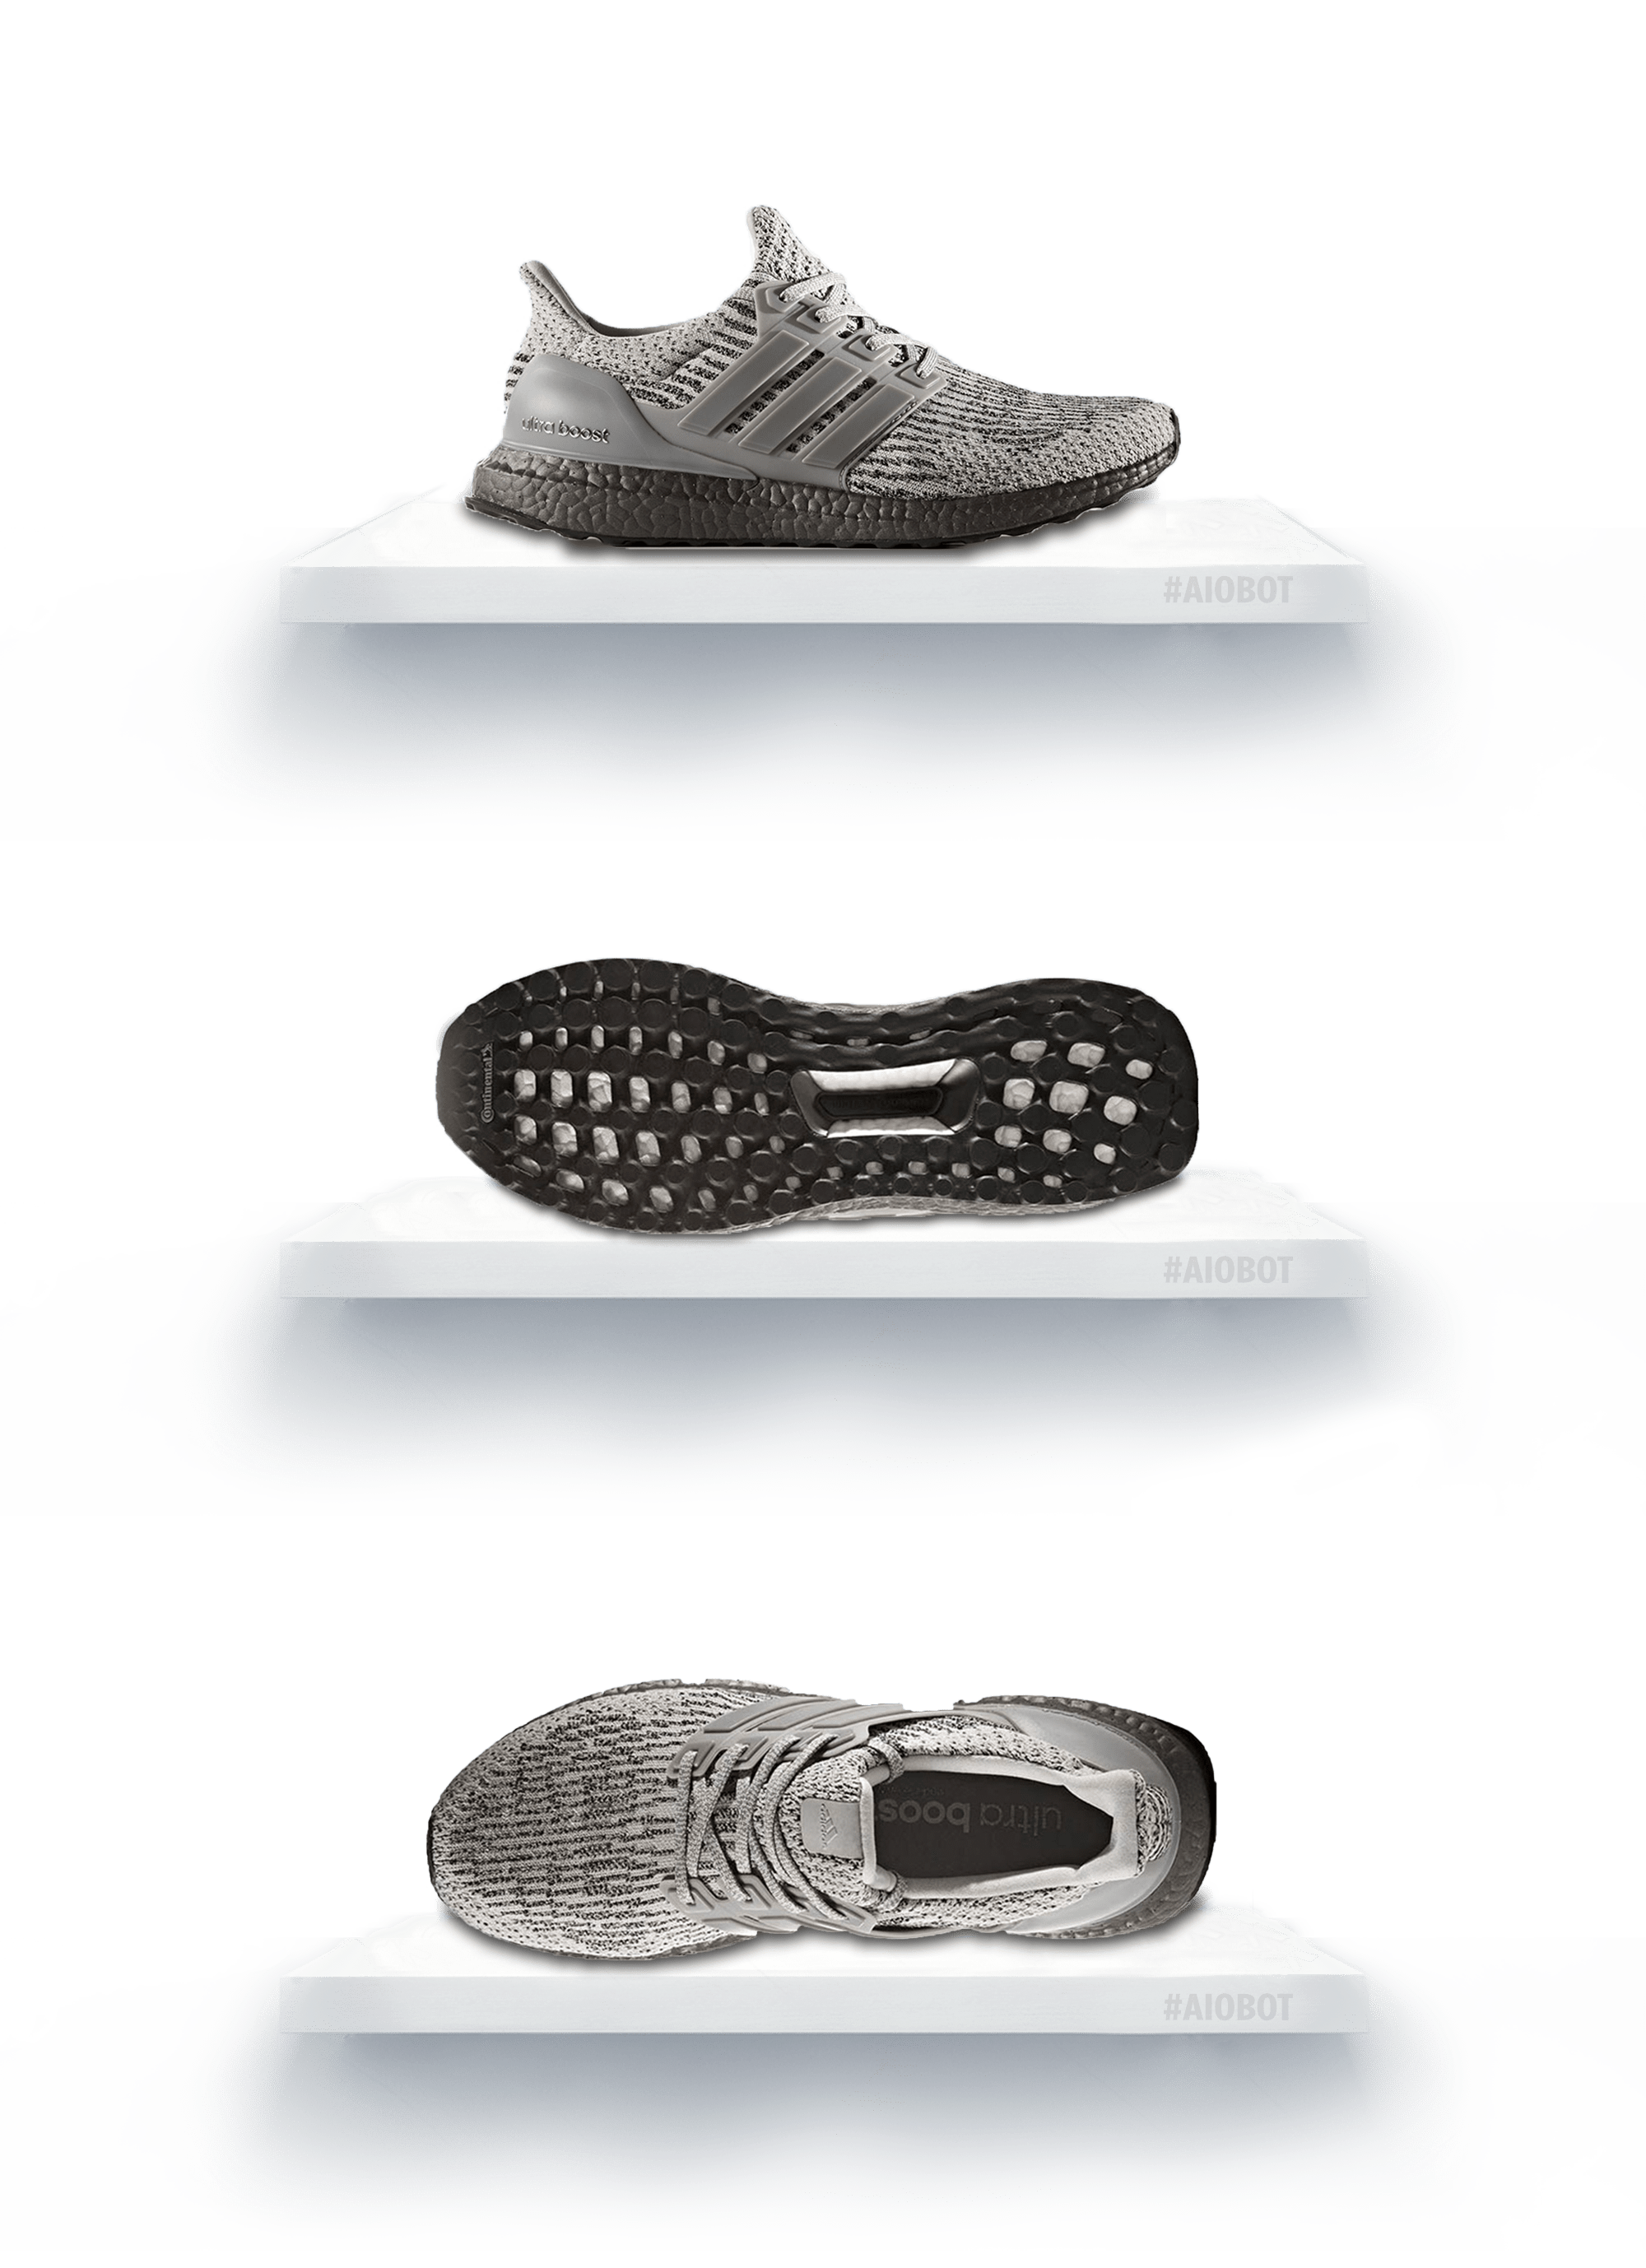 ultra boost grey black adidas ultra boost 1 0 2 0 3 0. Black Bedroom Furniture Sets. Home Design Ideas